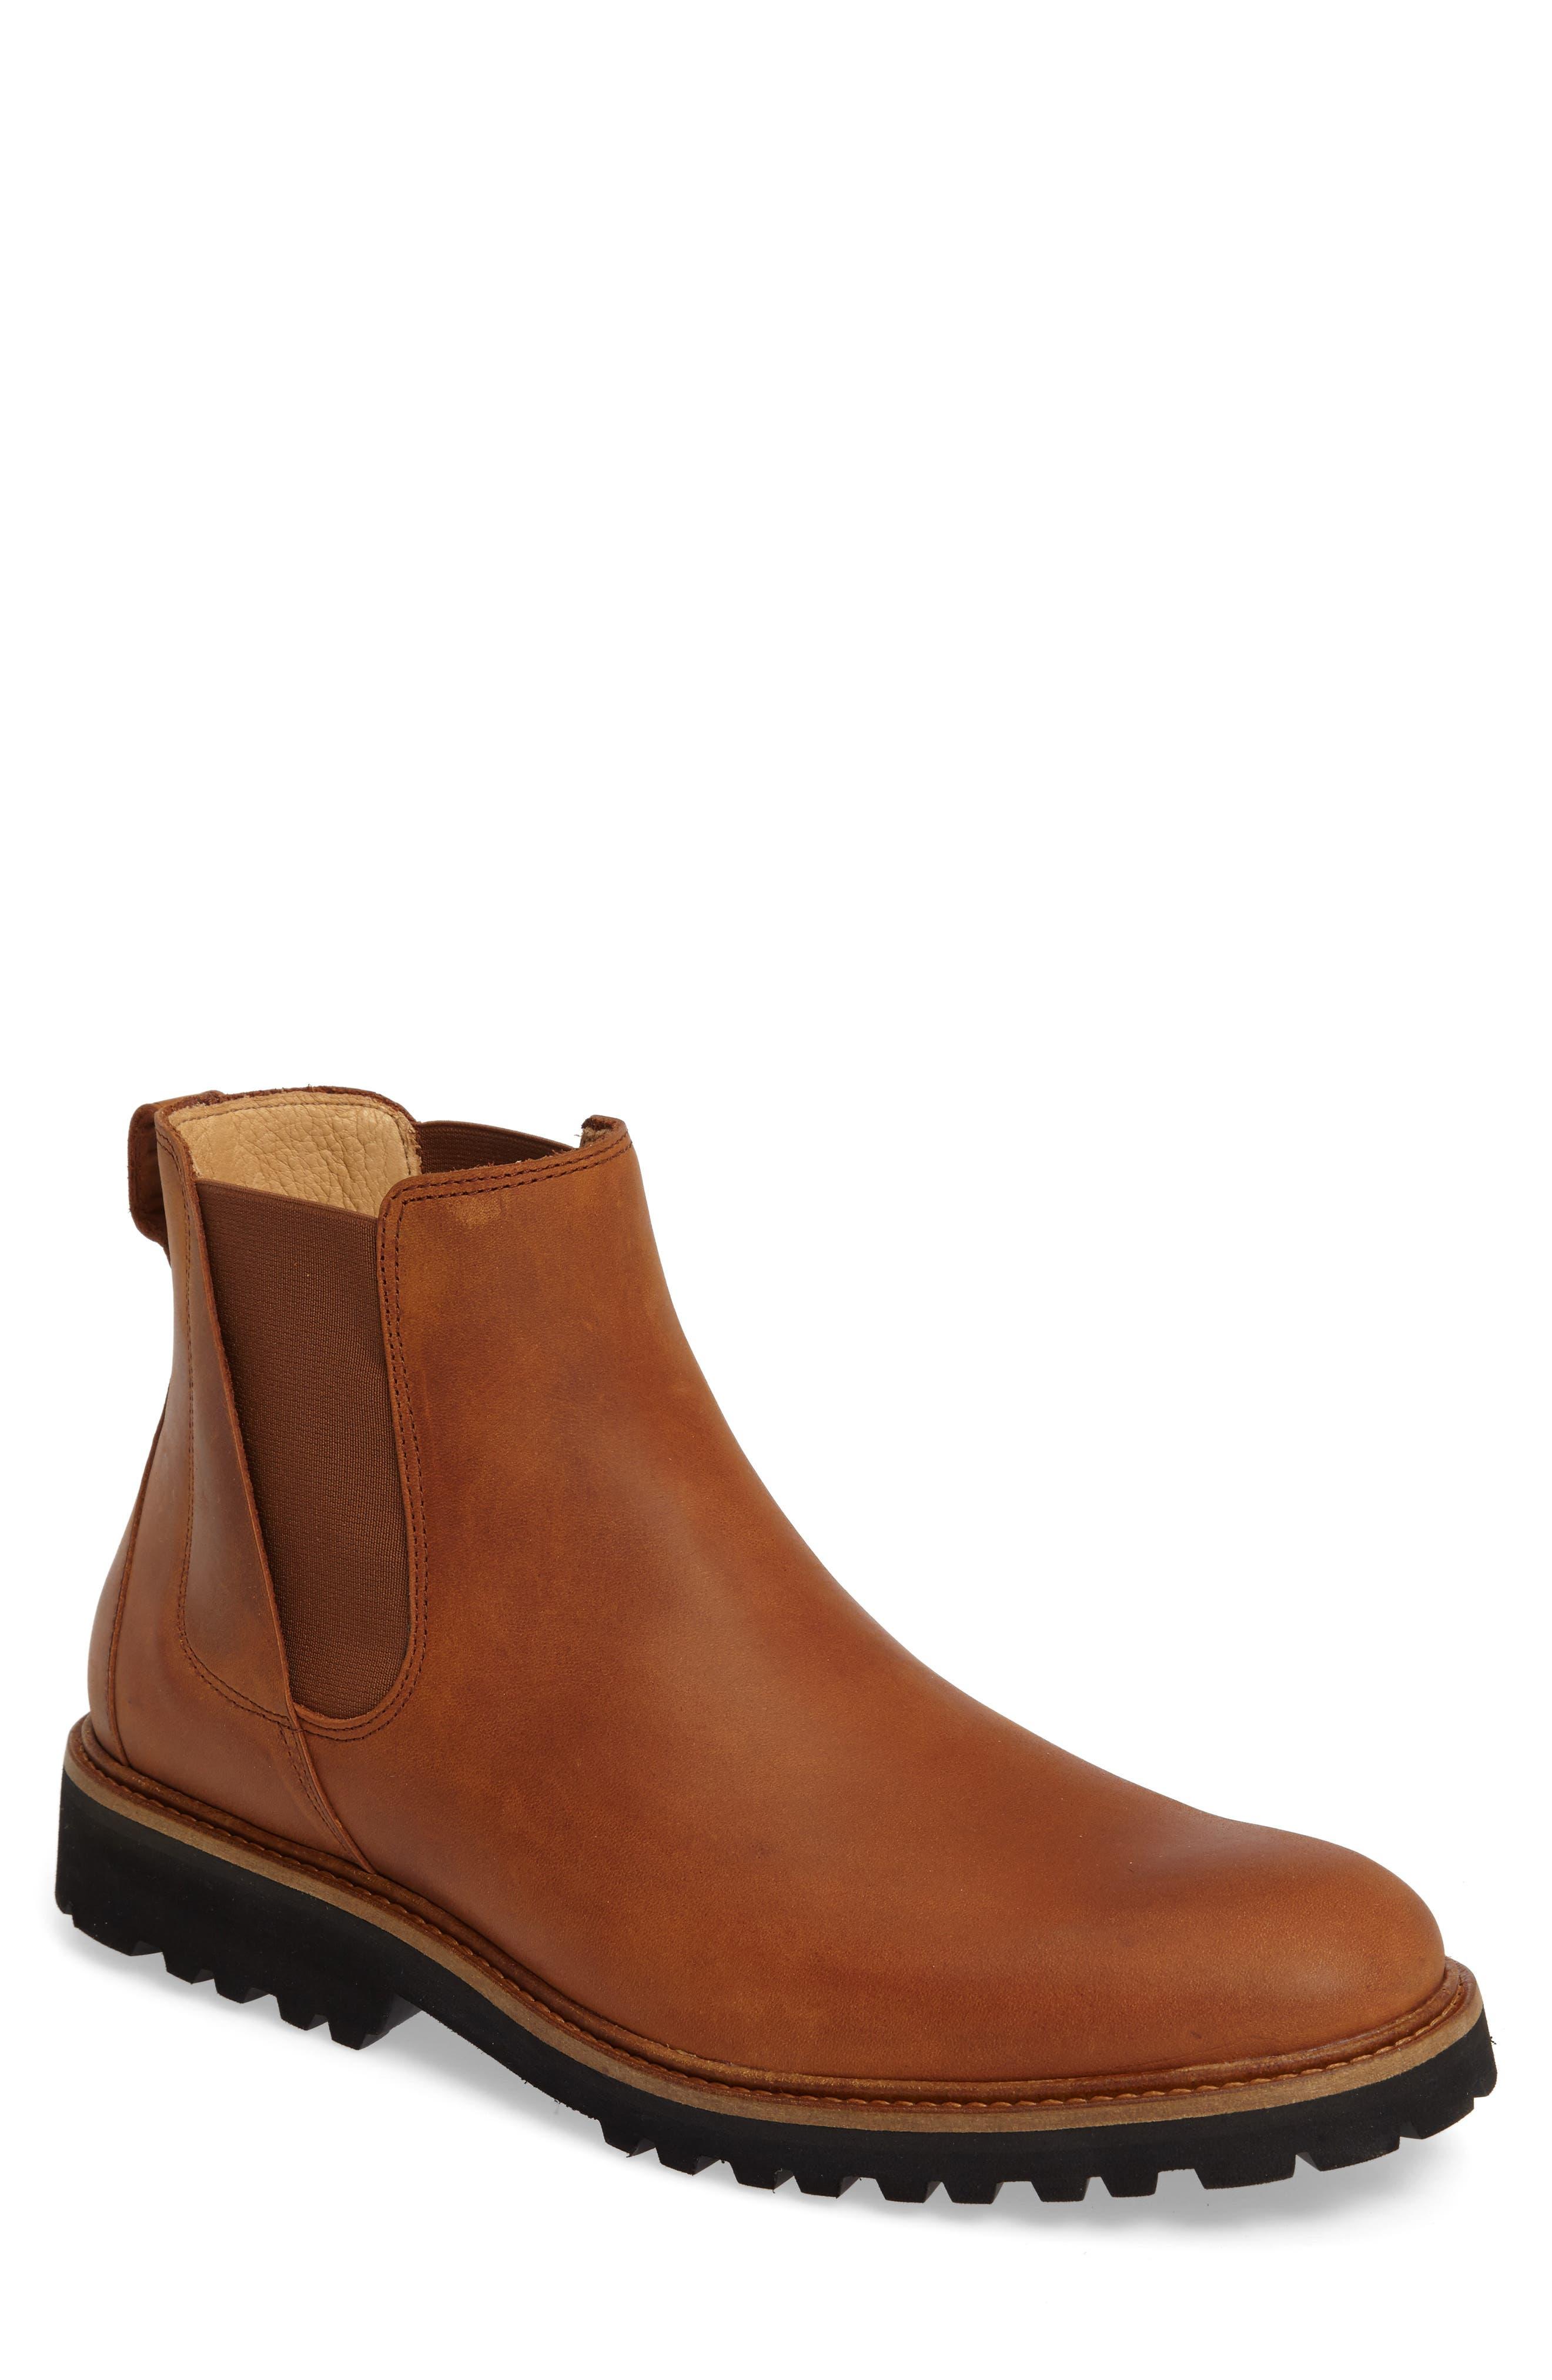 Crosstown Cowboy Chelsea Boot,                         Main,                         color, 215